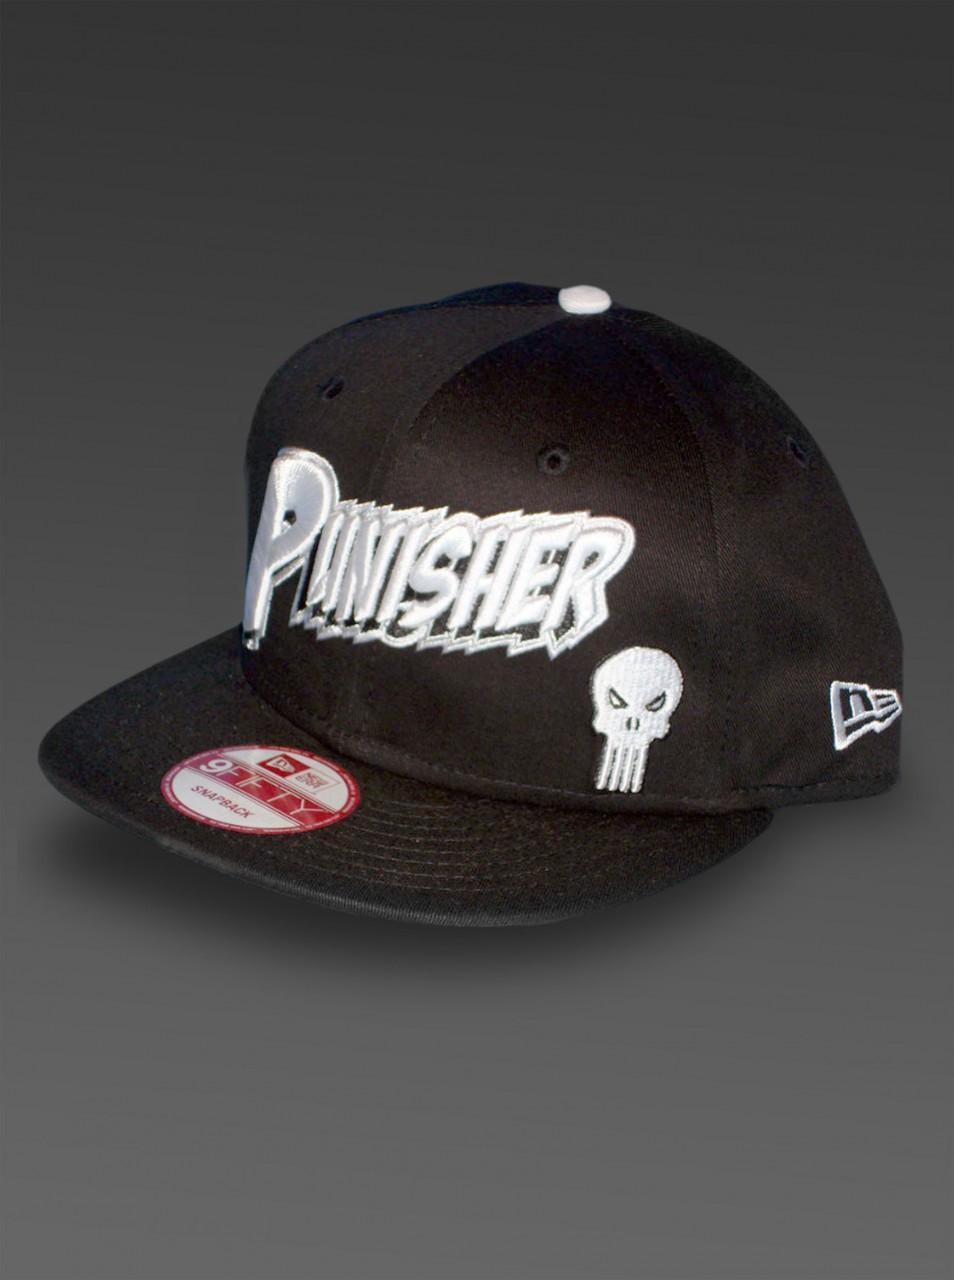 00c8e1f13be Punisher New Era 9Fifty Snapback Hat Marvel Comics Adjustable Cap in Black  Left